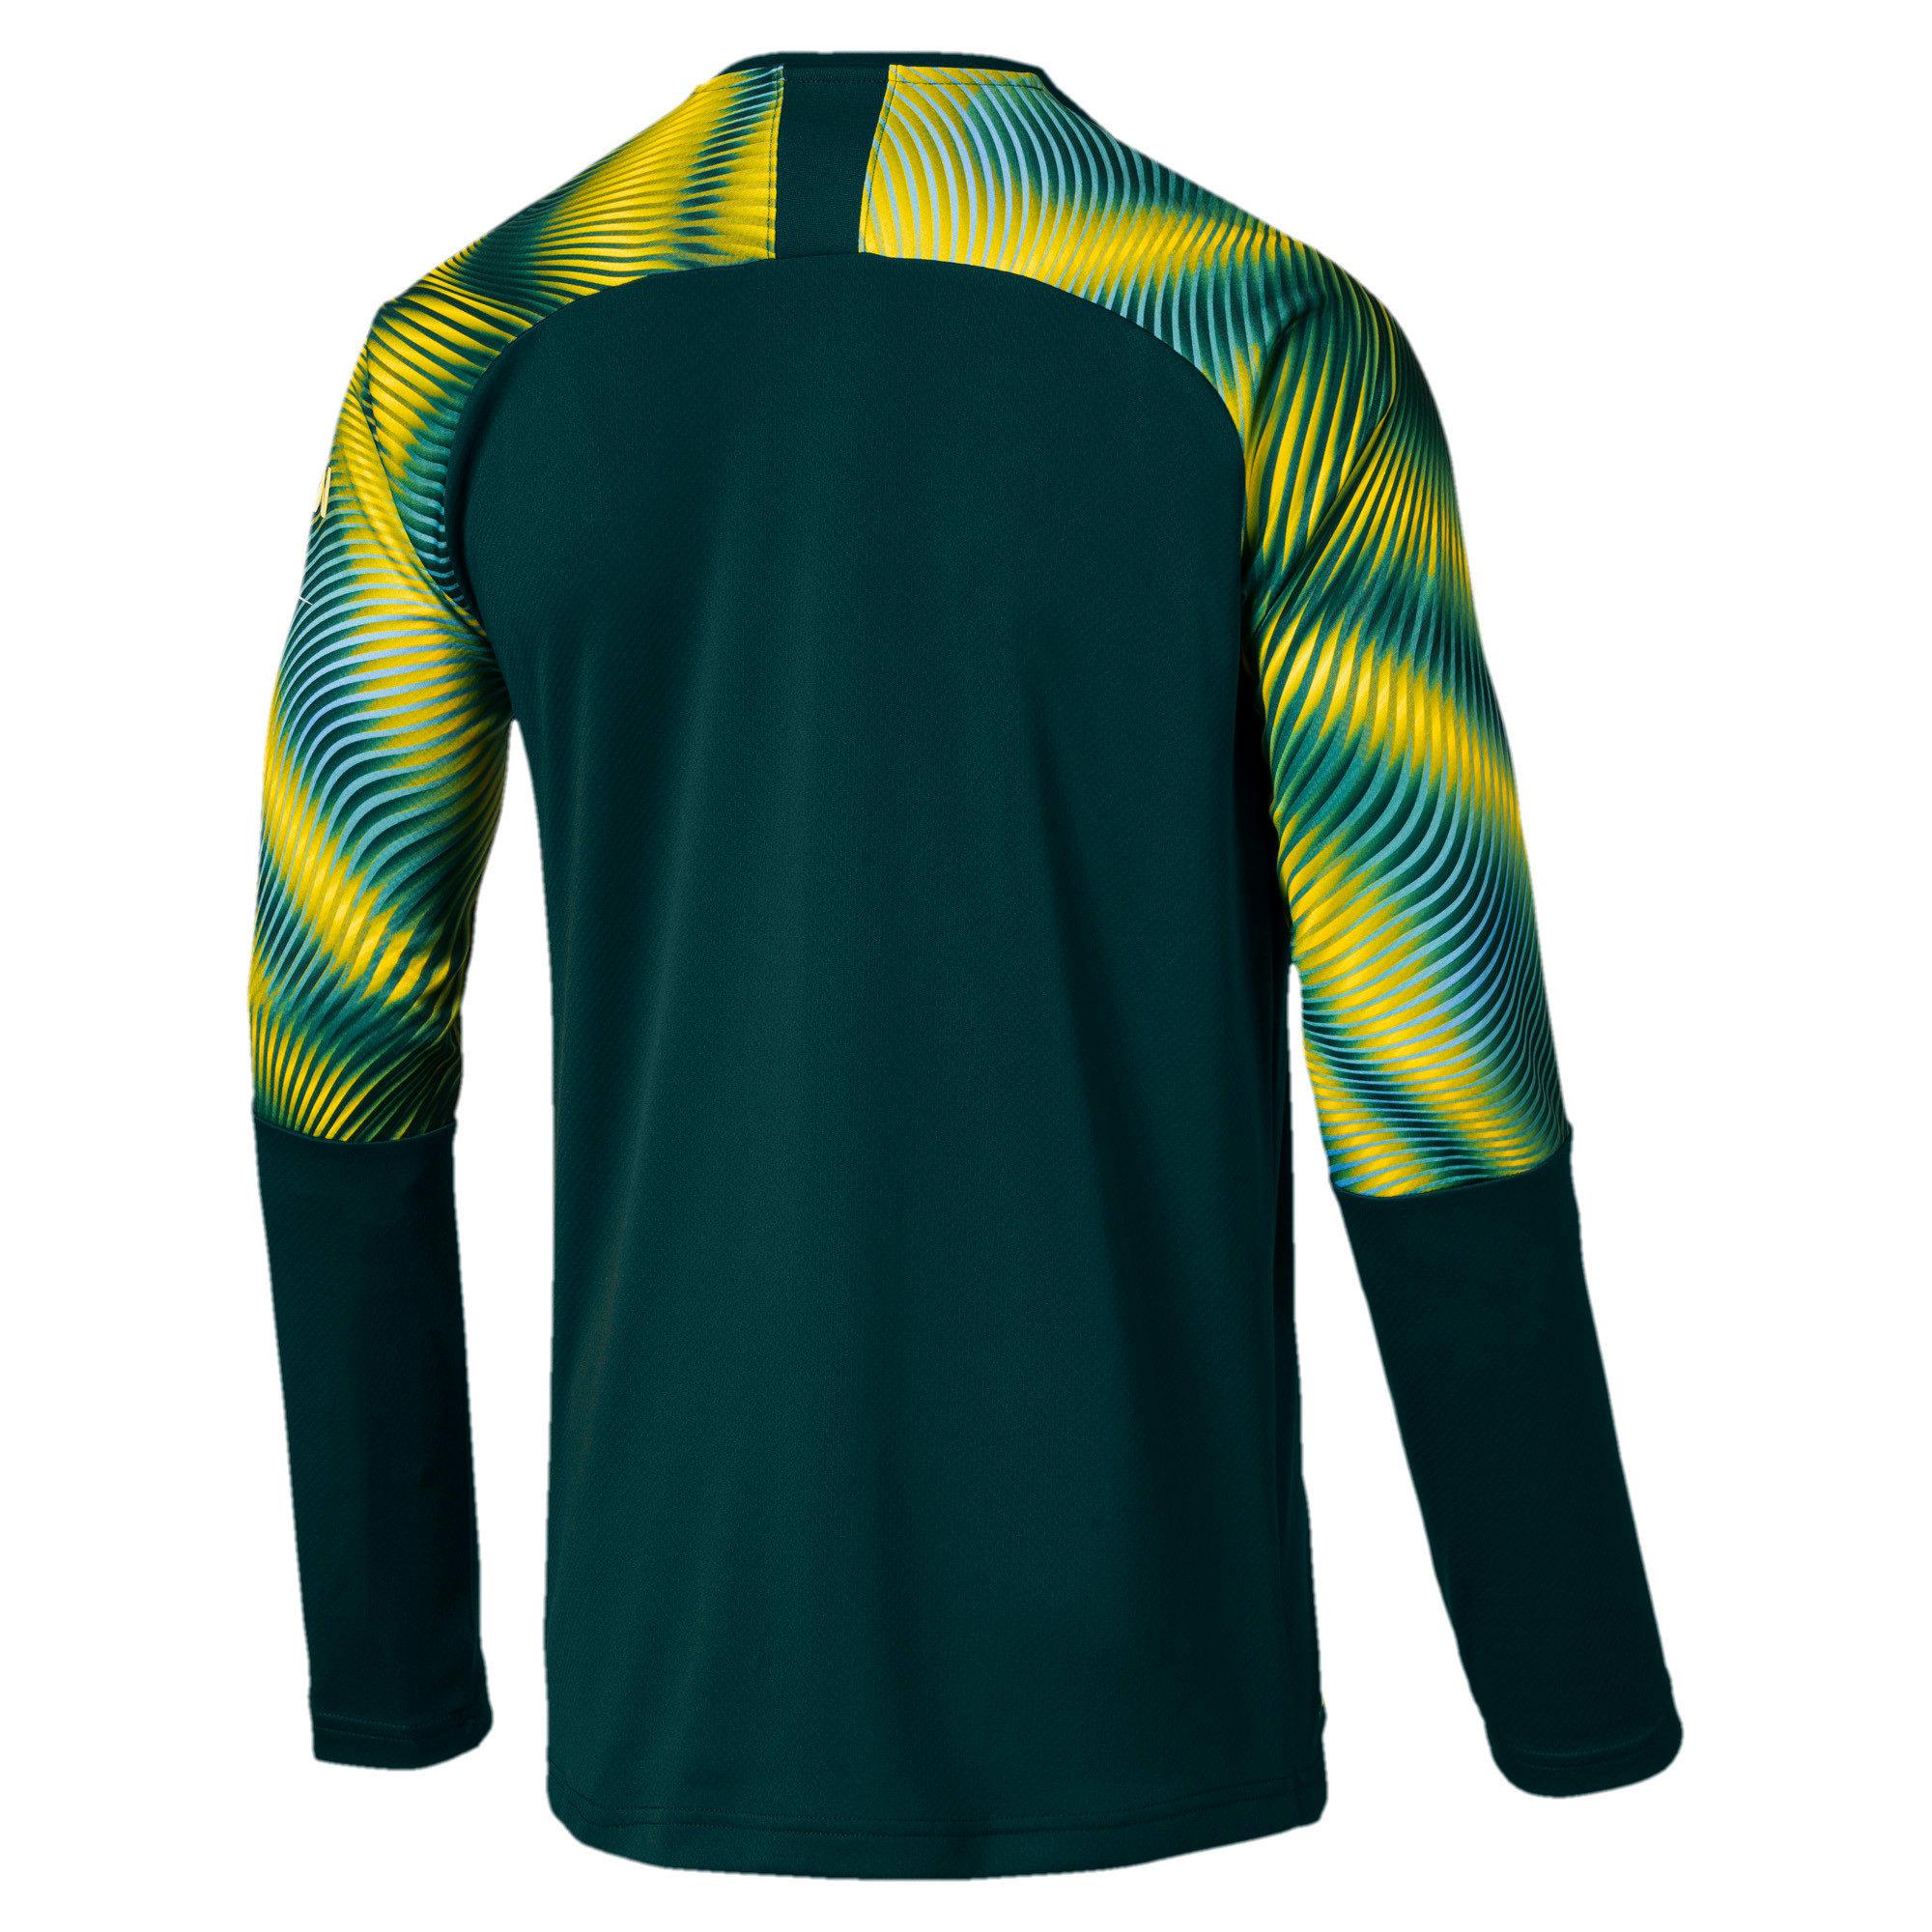 Miniatura 2 de Réplica de camiseta de arquero de Manchester City FC para hombre, Ponderosa Pine-Cyber Yellow, mediano